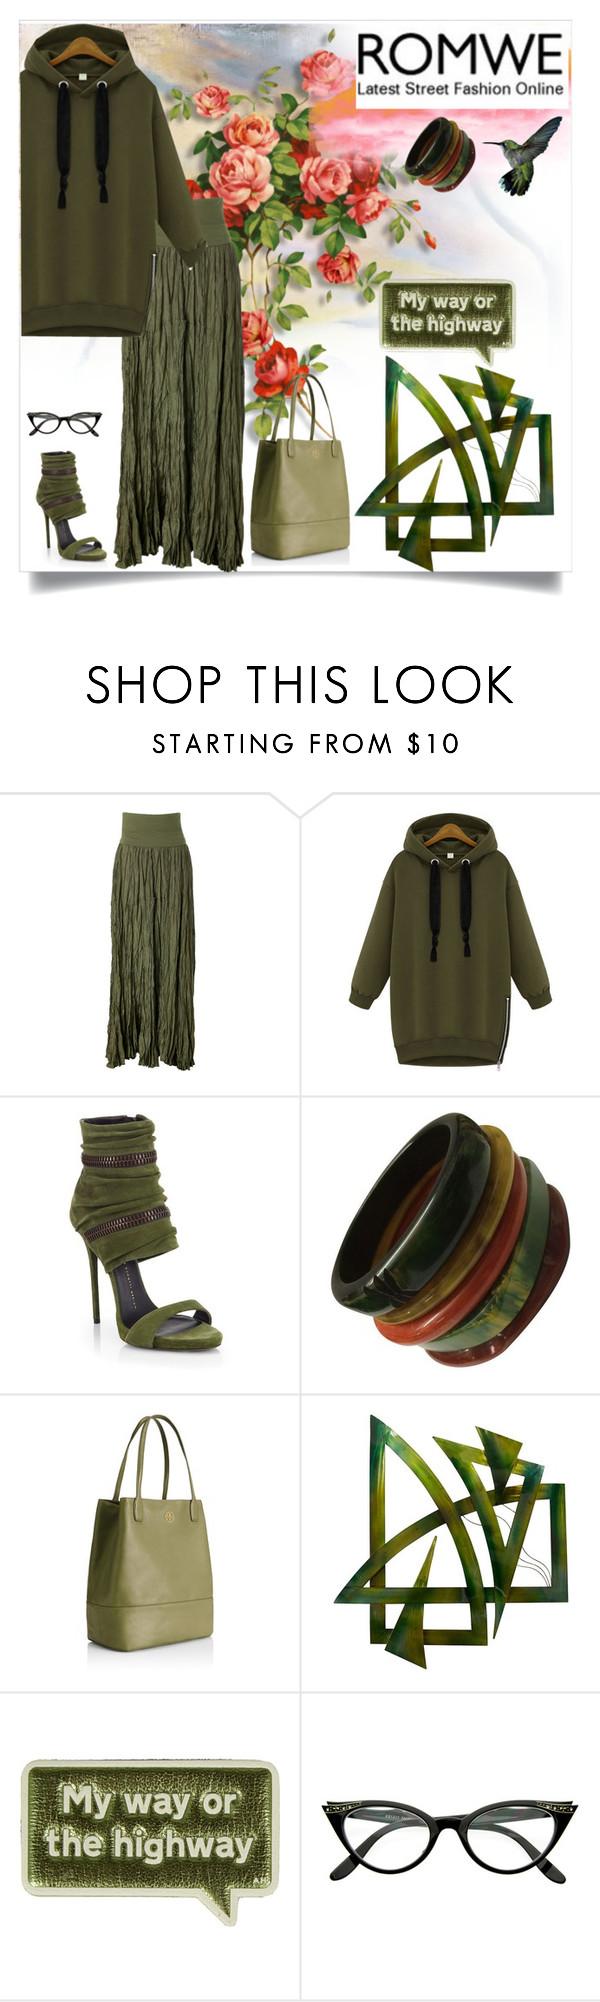 """Green Sweatshirt by ROMWE"" by bhattasharmaluna ❤ liked on Polyvore featuring mode, Donna Karan, Giuseppe Zanotti, Tory Burch, Universal Lighting and Decor, Anya Hindmarch, GREEN, romwe et Sweatshirt"